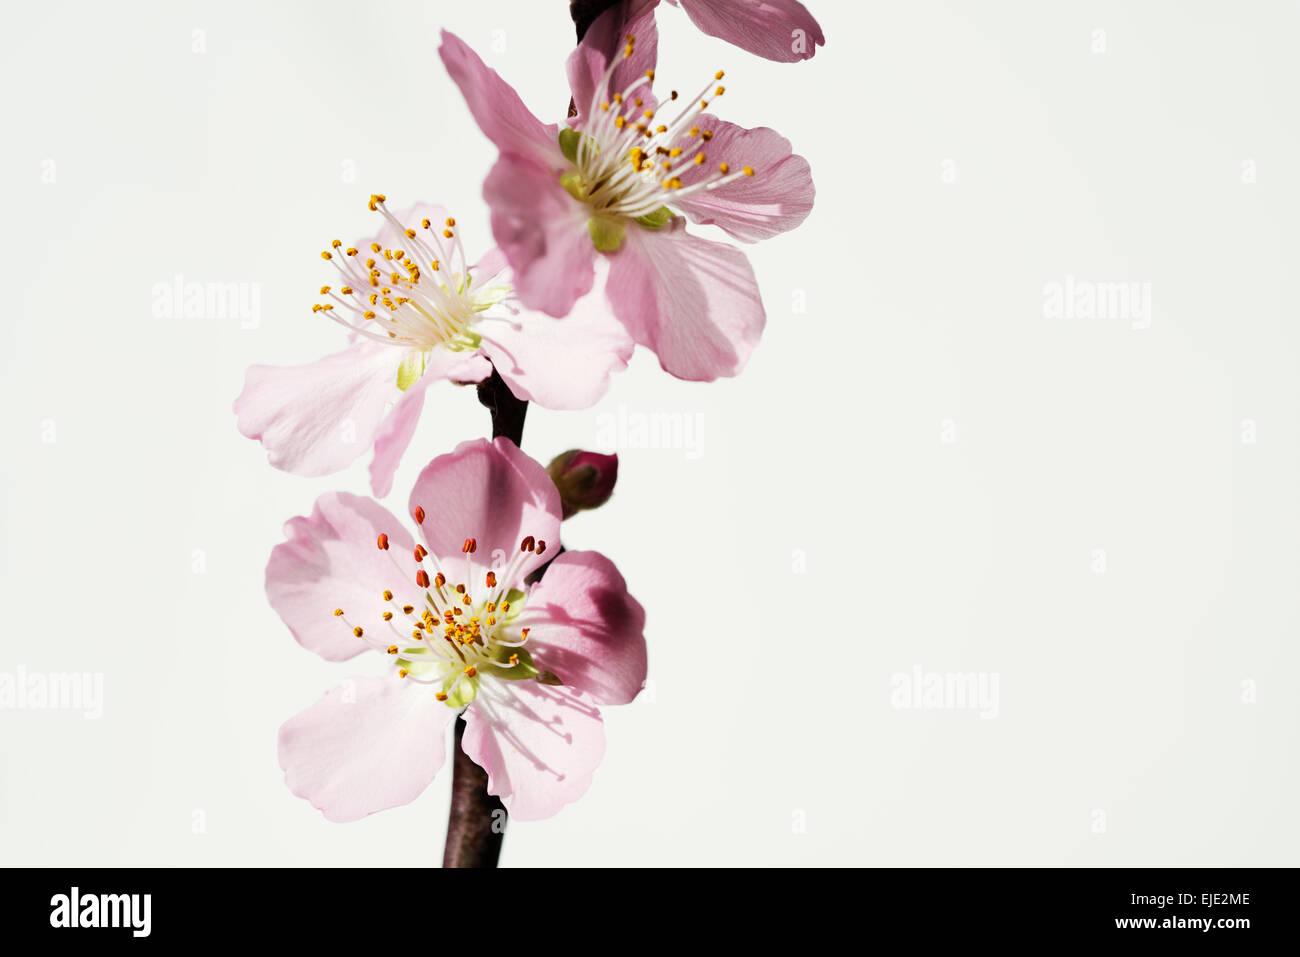 peach blossom branch - Stock Image